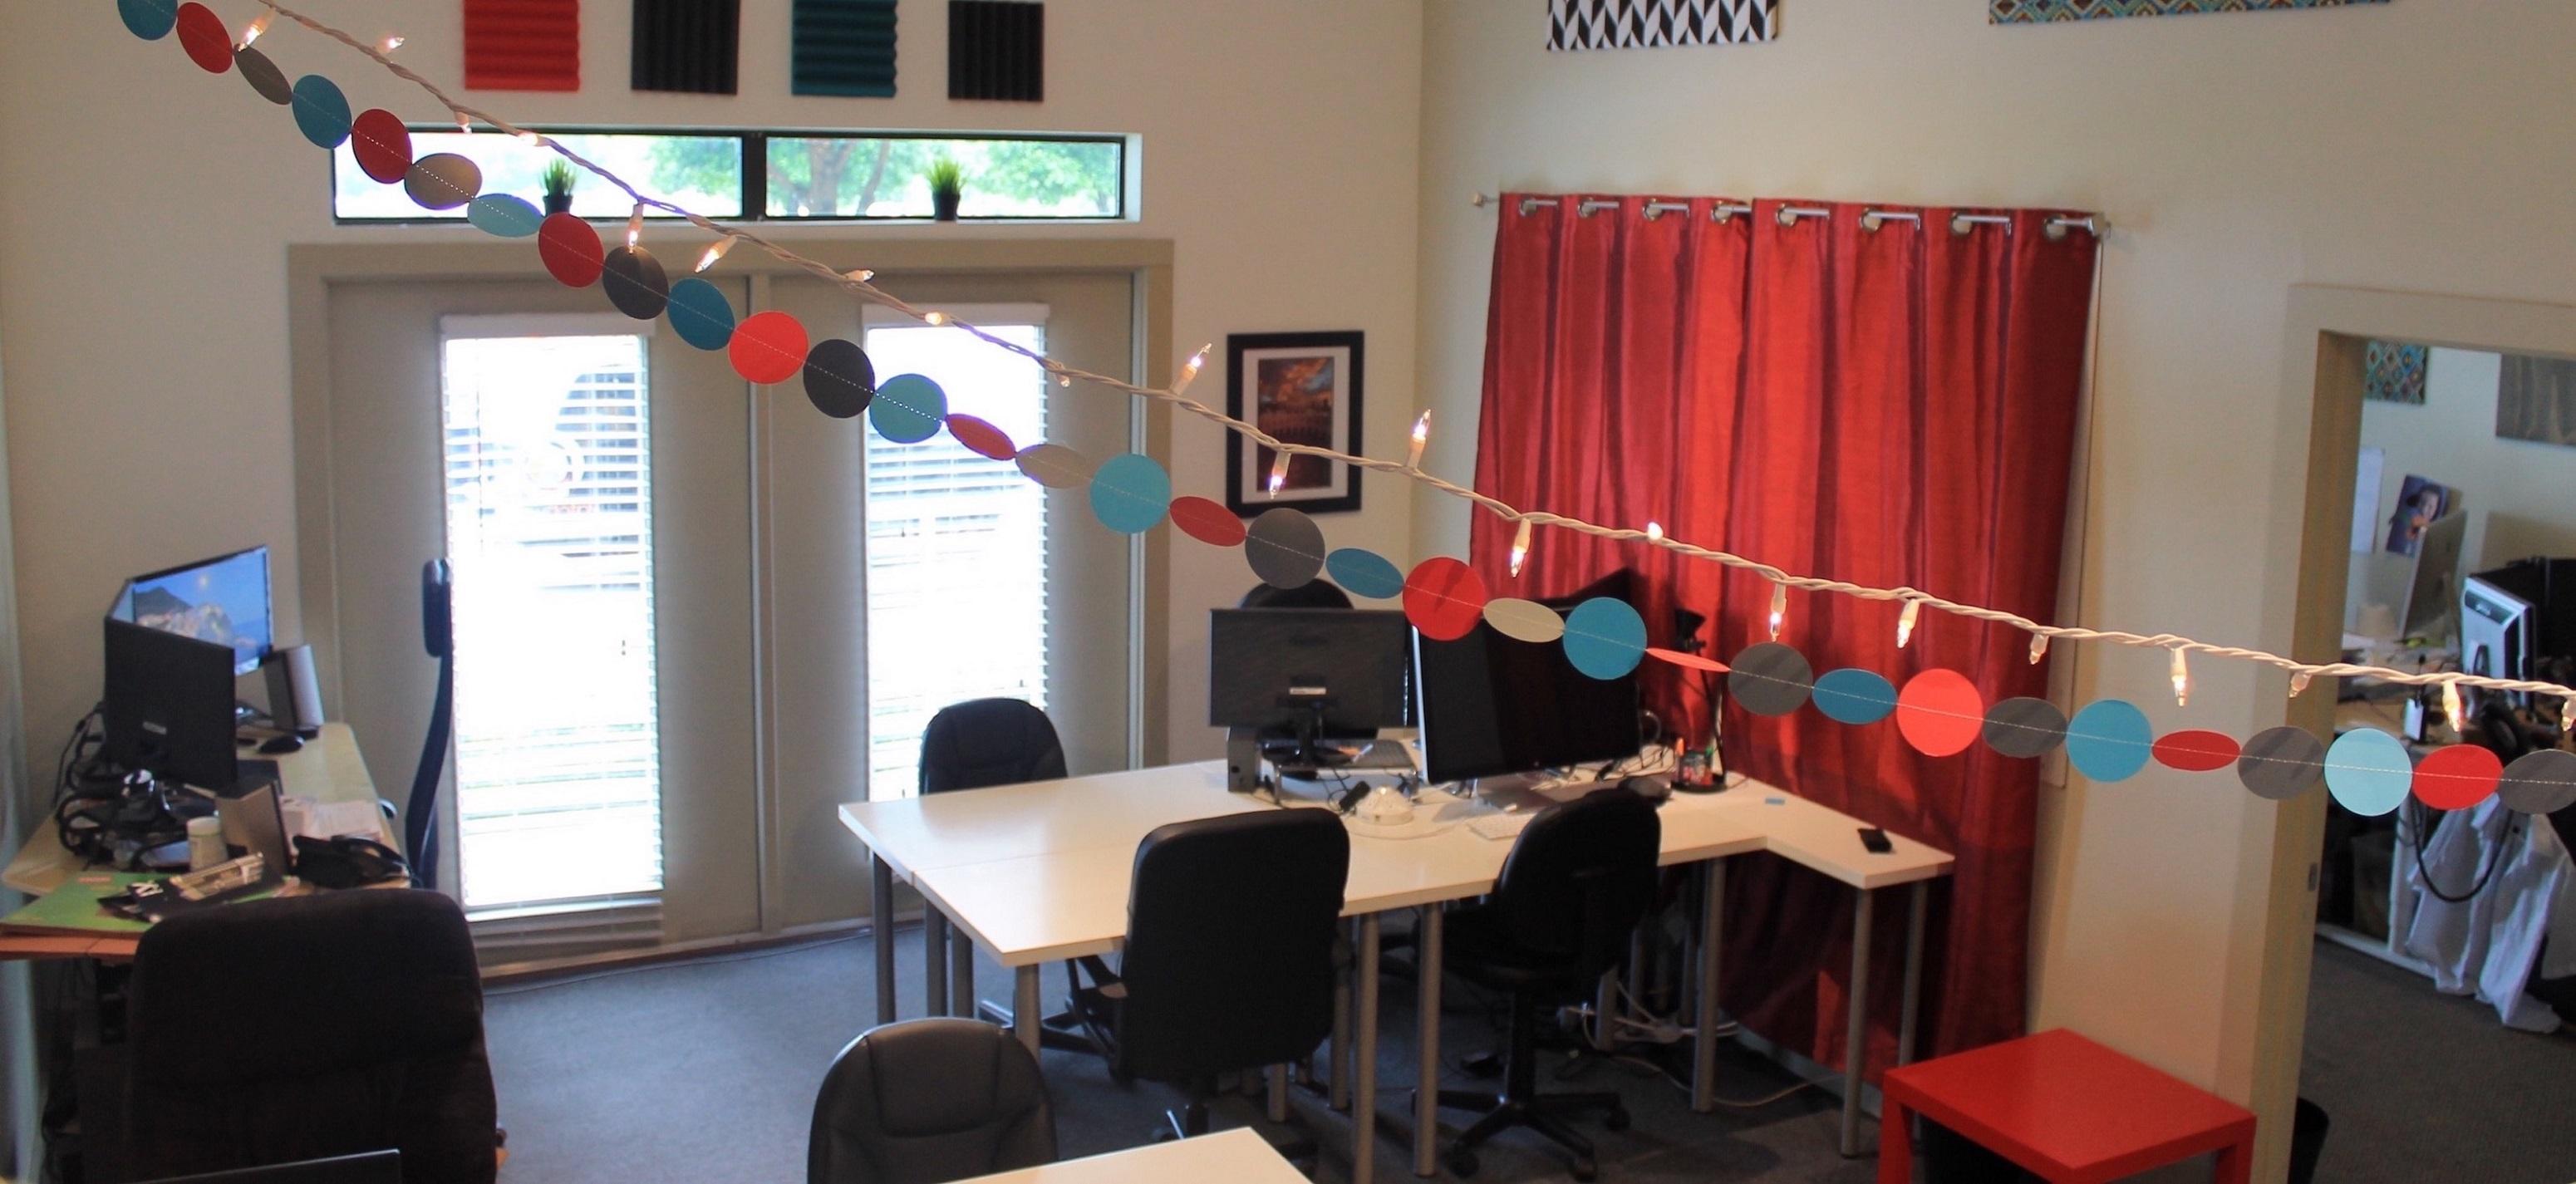 Patchwork Austin Coworking - Open Desk Membership